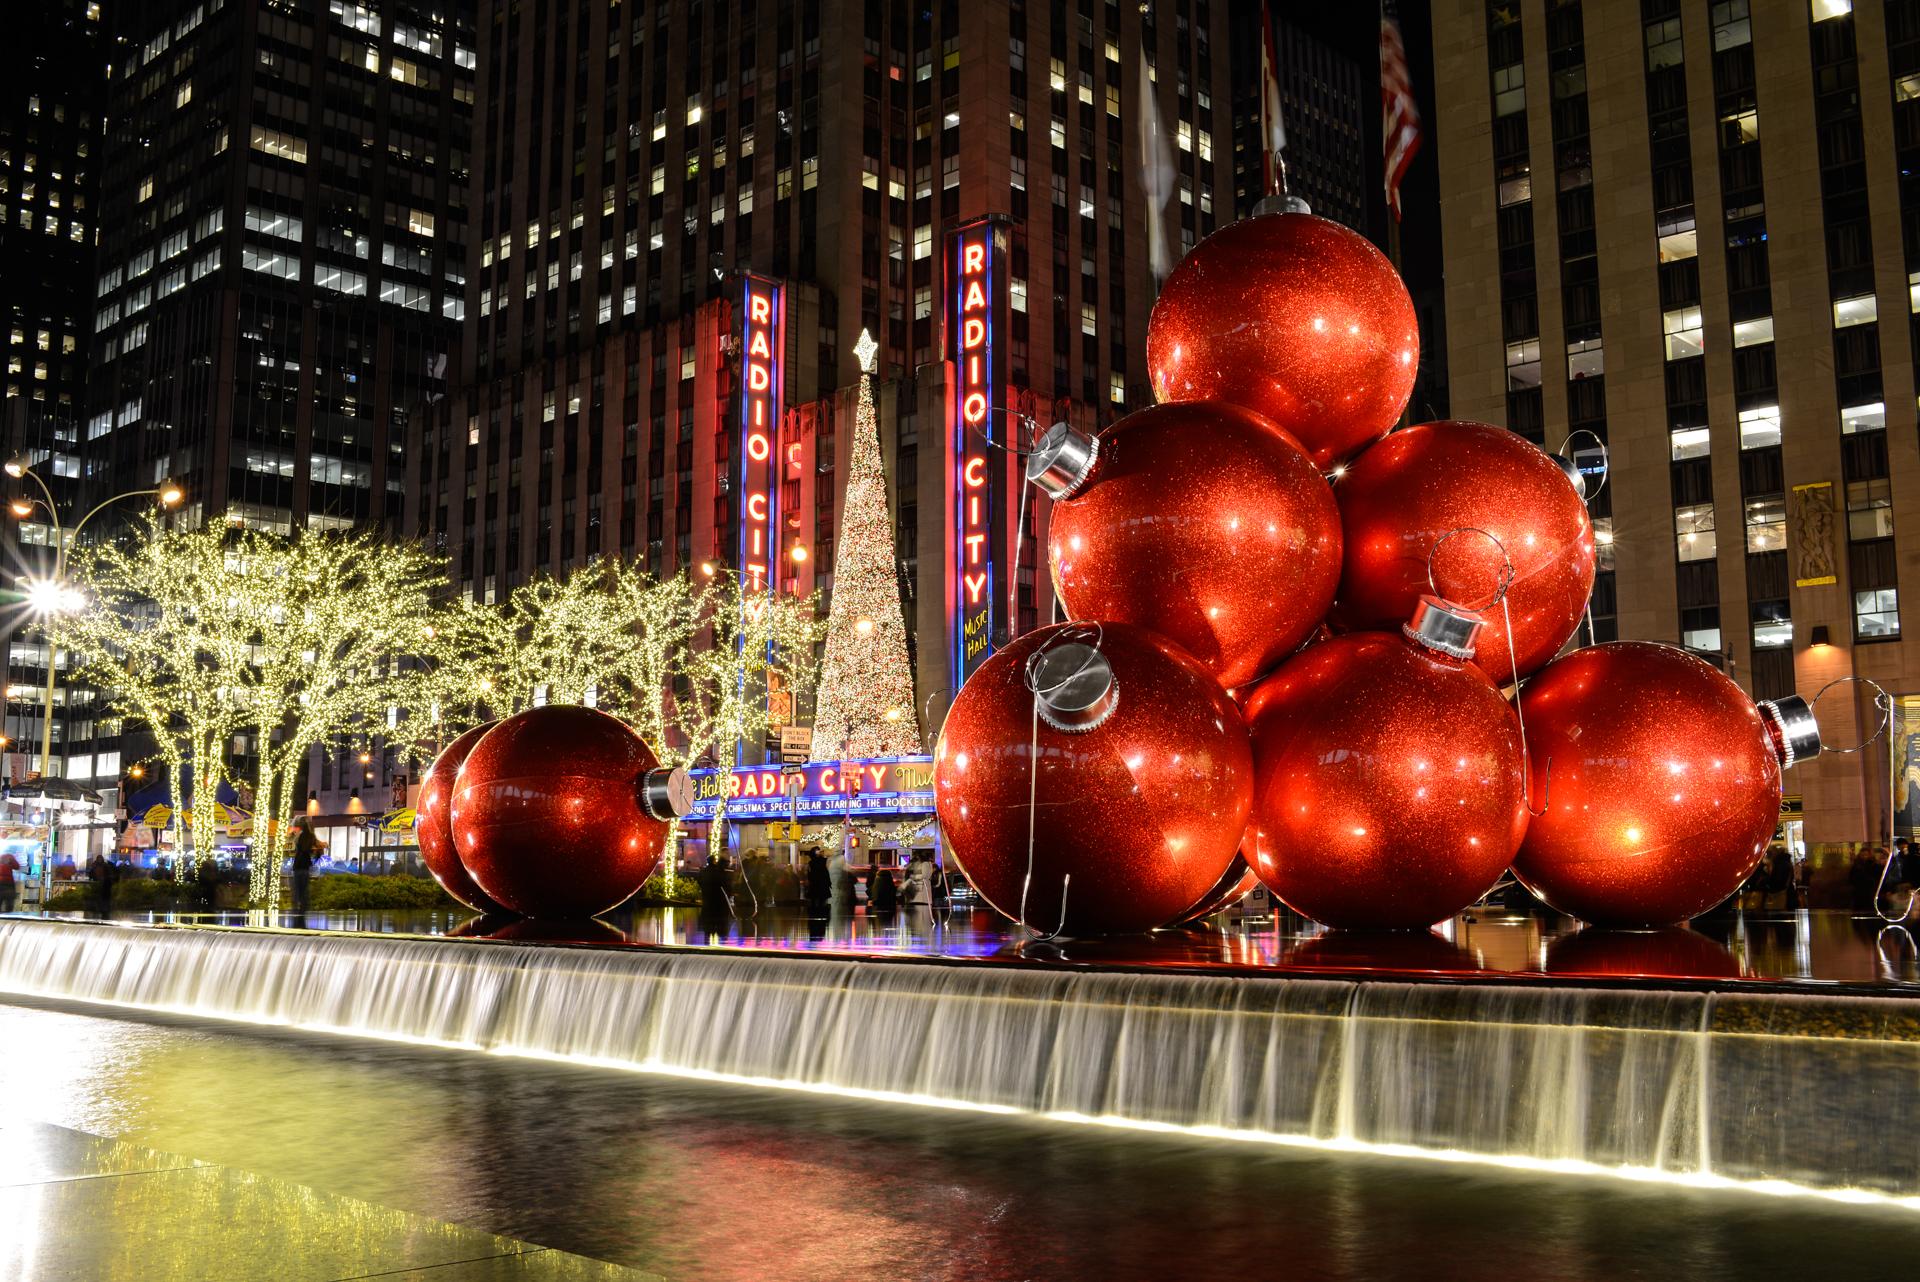 #BC2B0F Découvrir New York En 20 Photos Chapka Assurances 5469 decorations de noel new york 1920x1282 px @ aertt.com